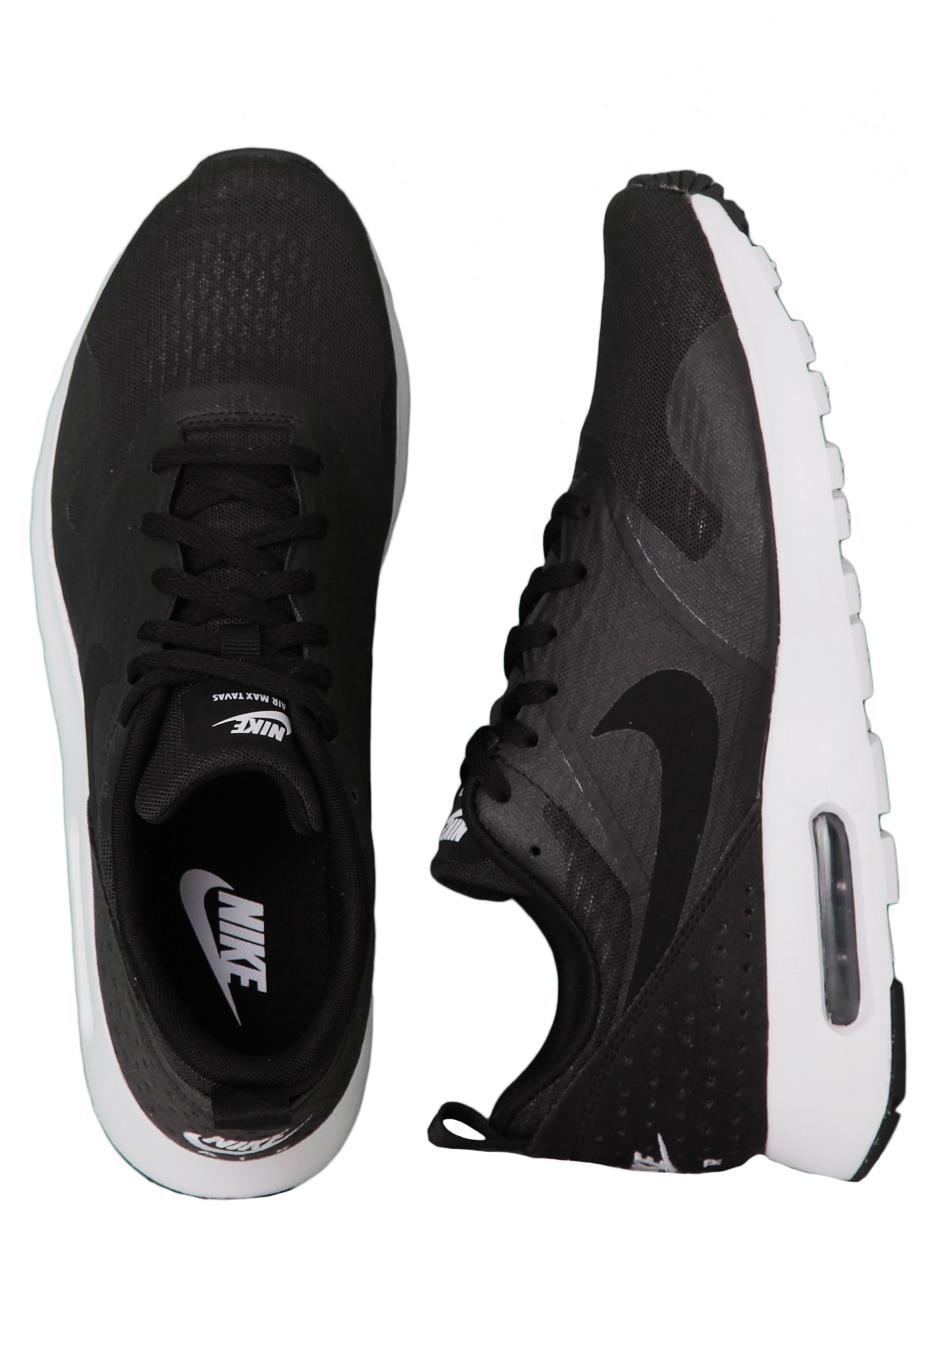 san francisco 82225 d3448 ... and Flyknit racer Nike - Air Max Tavas Essential BlackBlackWhite - Shoes  - Impericon.com UK ...